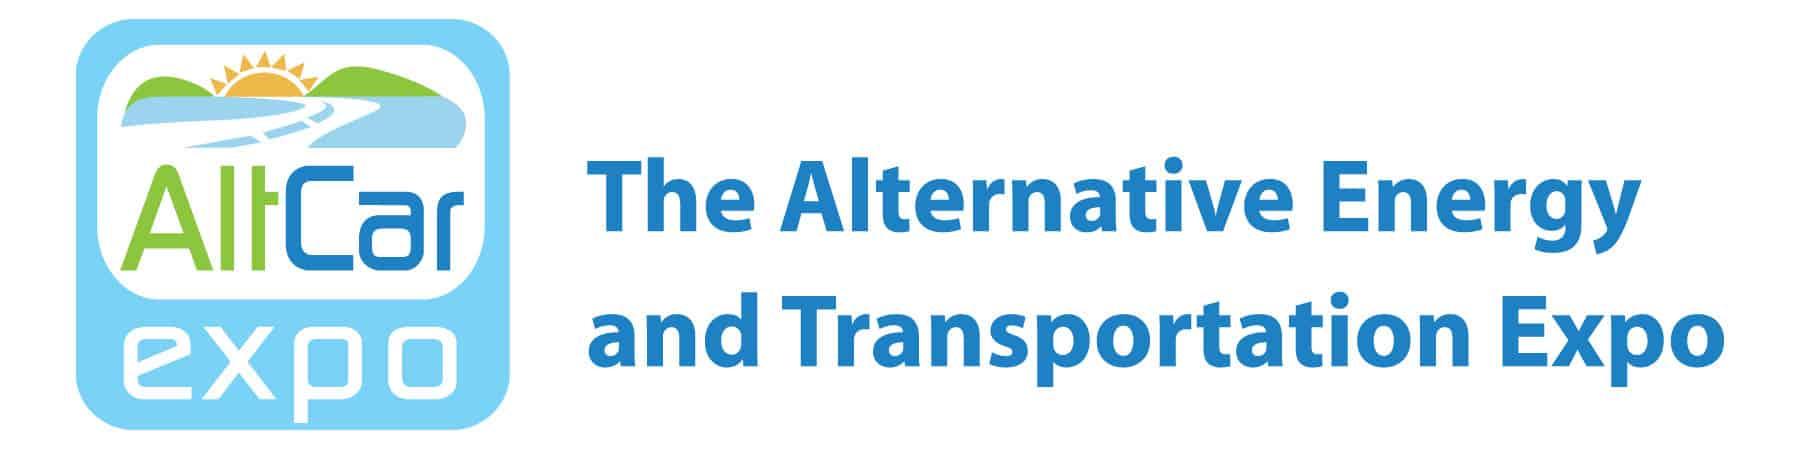 AltCar logo Tagline20copy